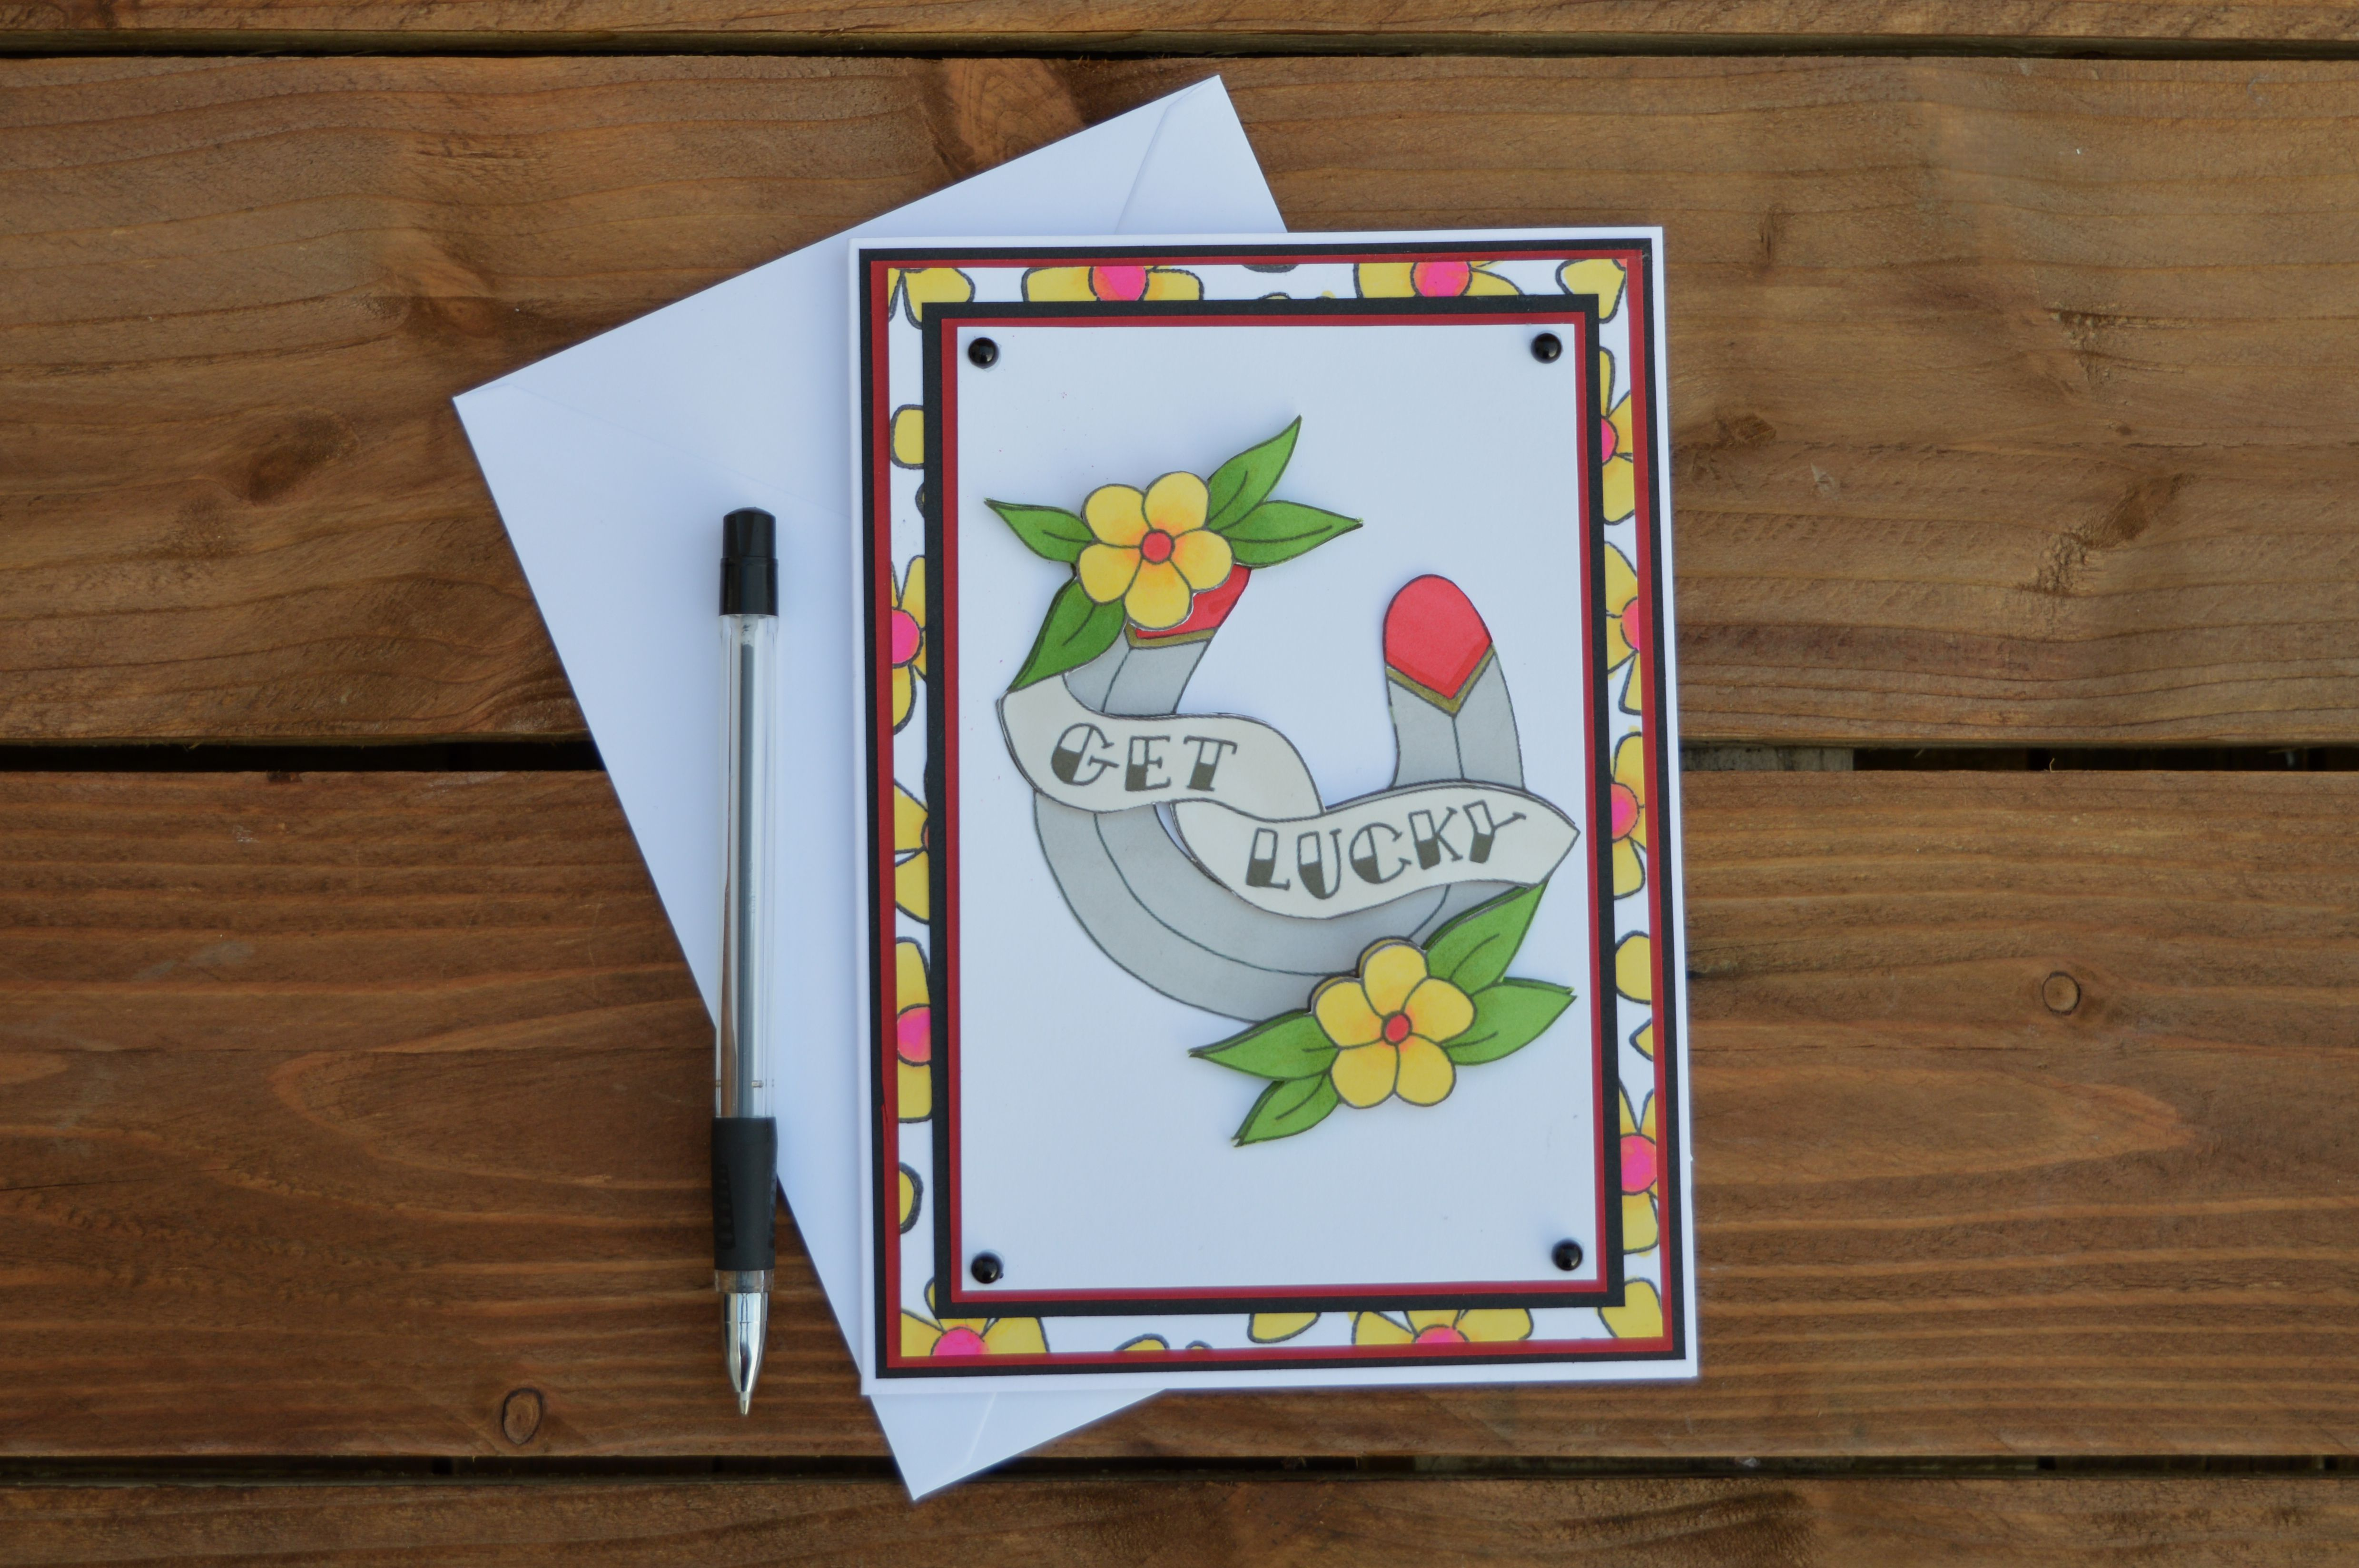 card illustration greetings get gift lucky cards papercraft horseshoe alternative horse tattoo art